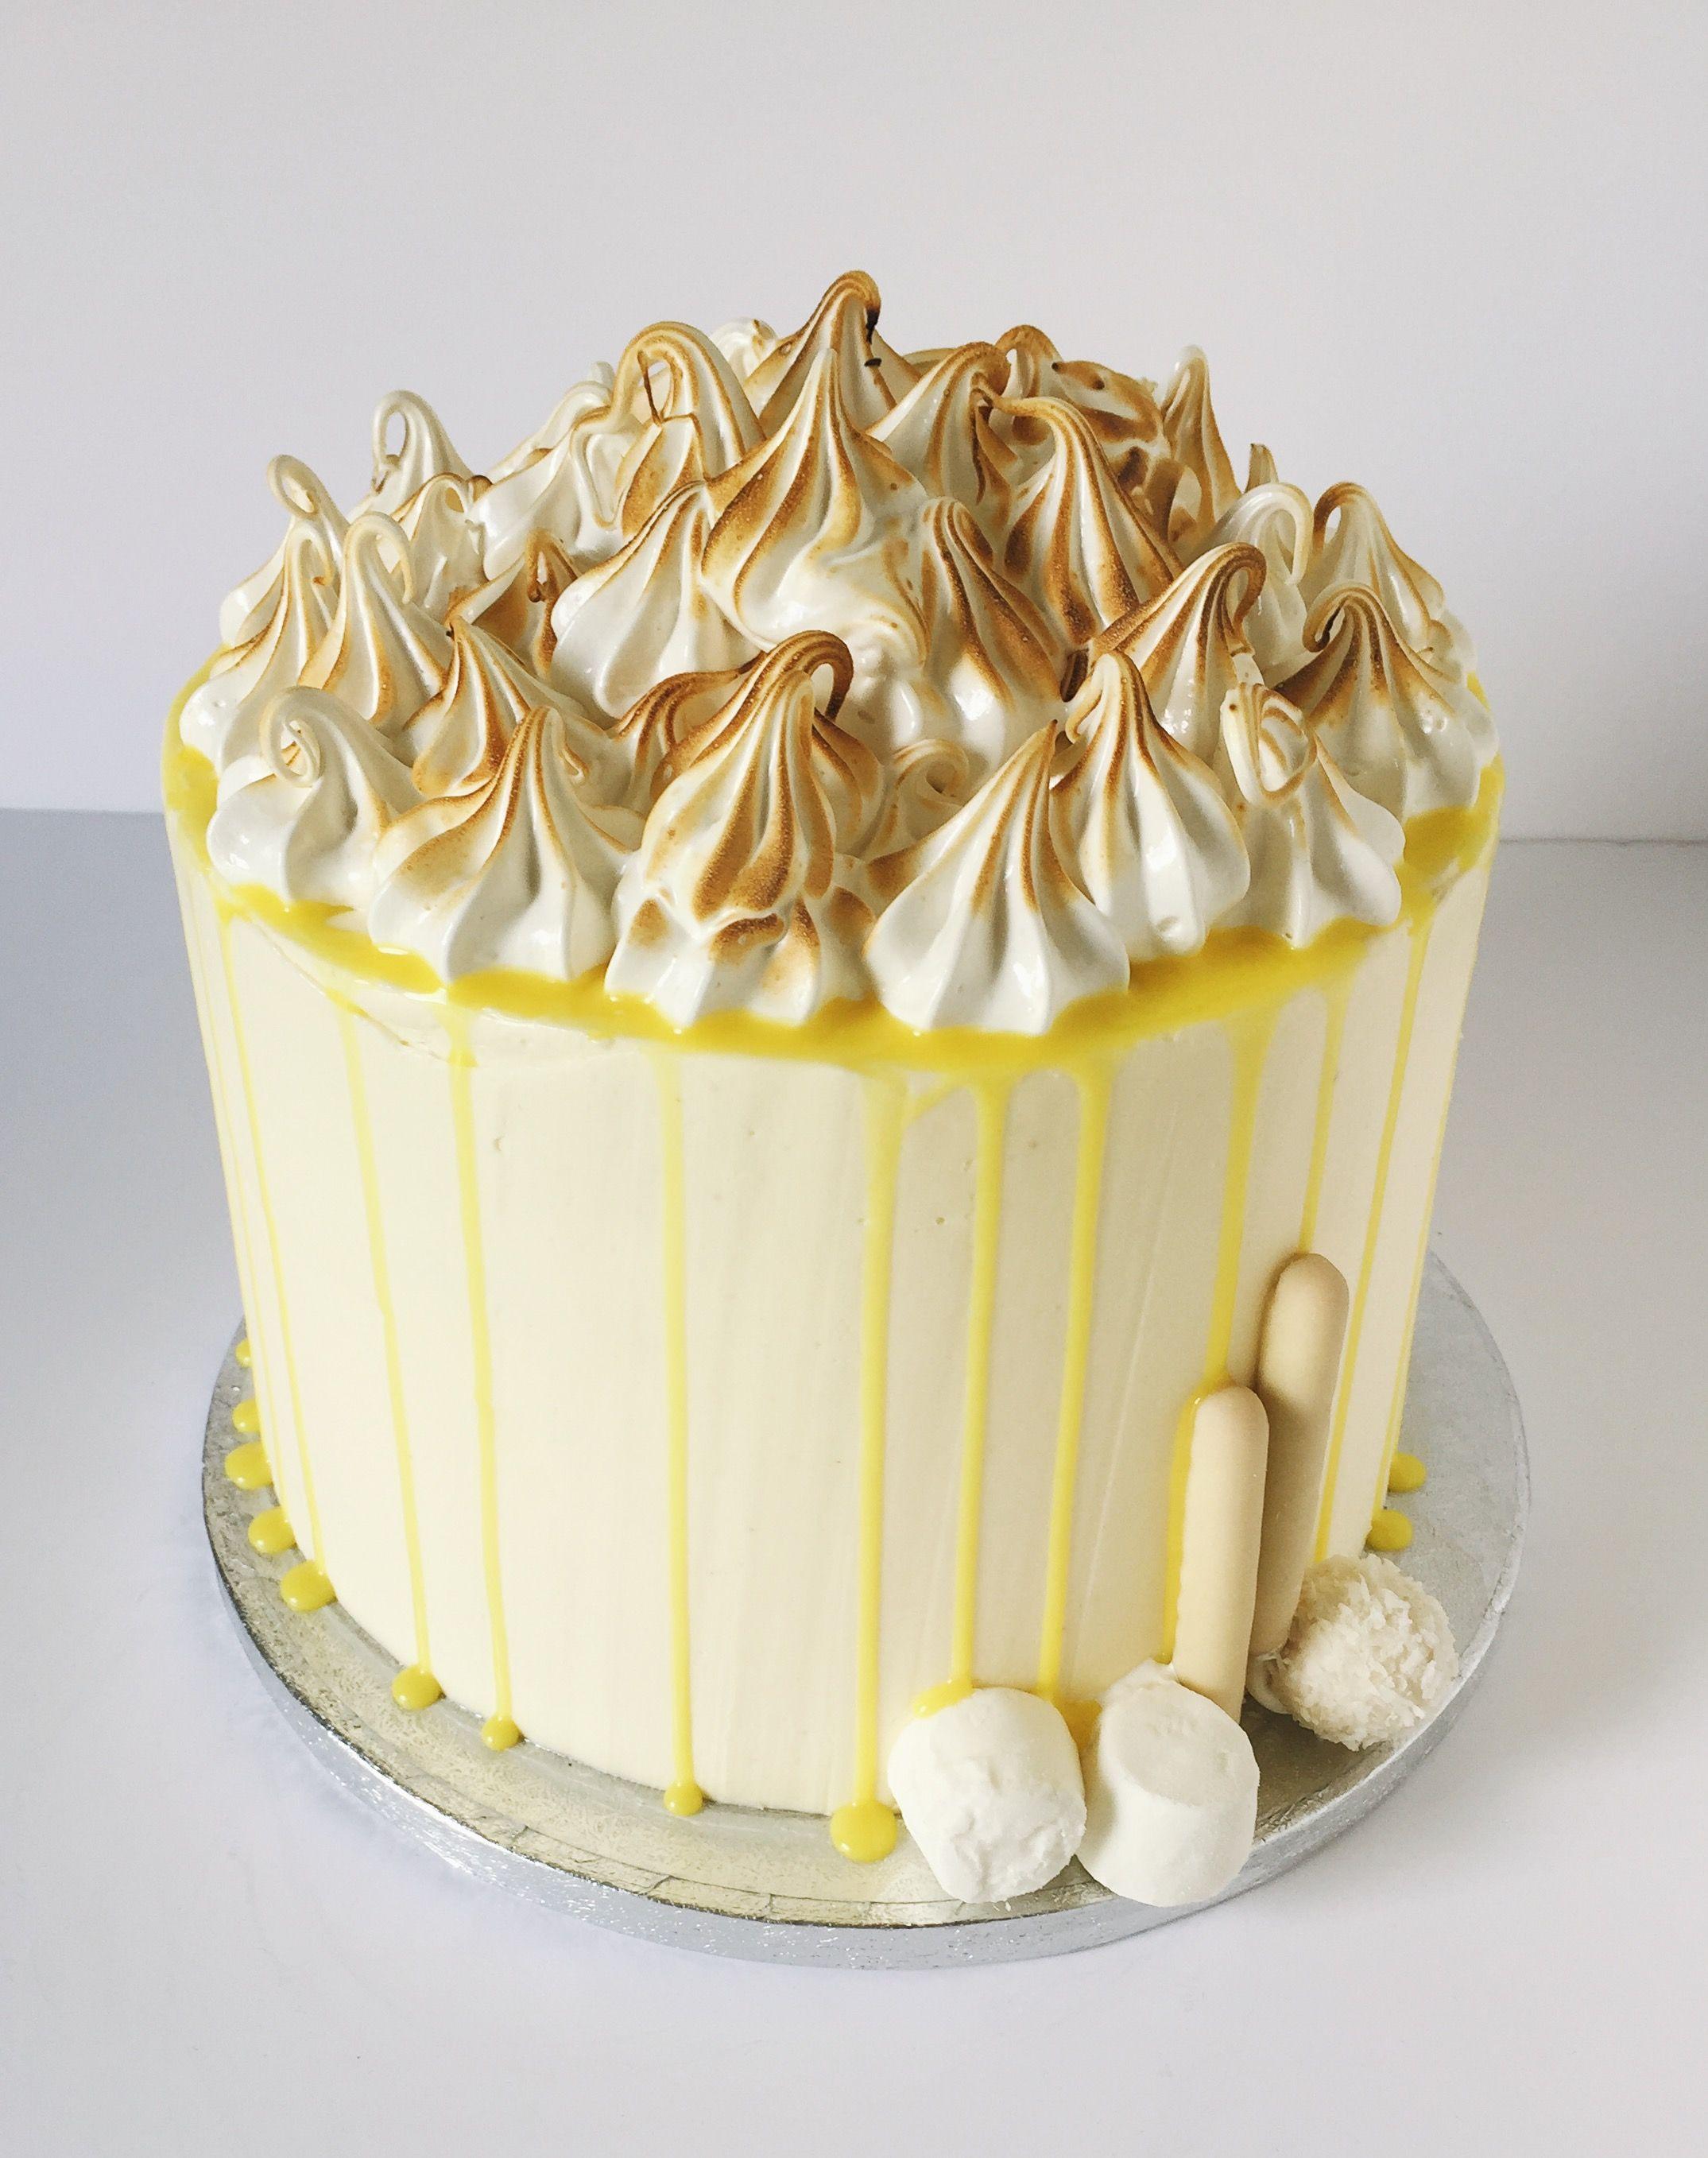 Lemon Meringue Pie Cake With Meringue Marshmallow Frosting Lemon